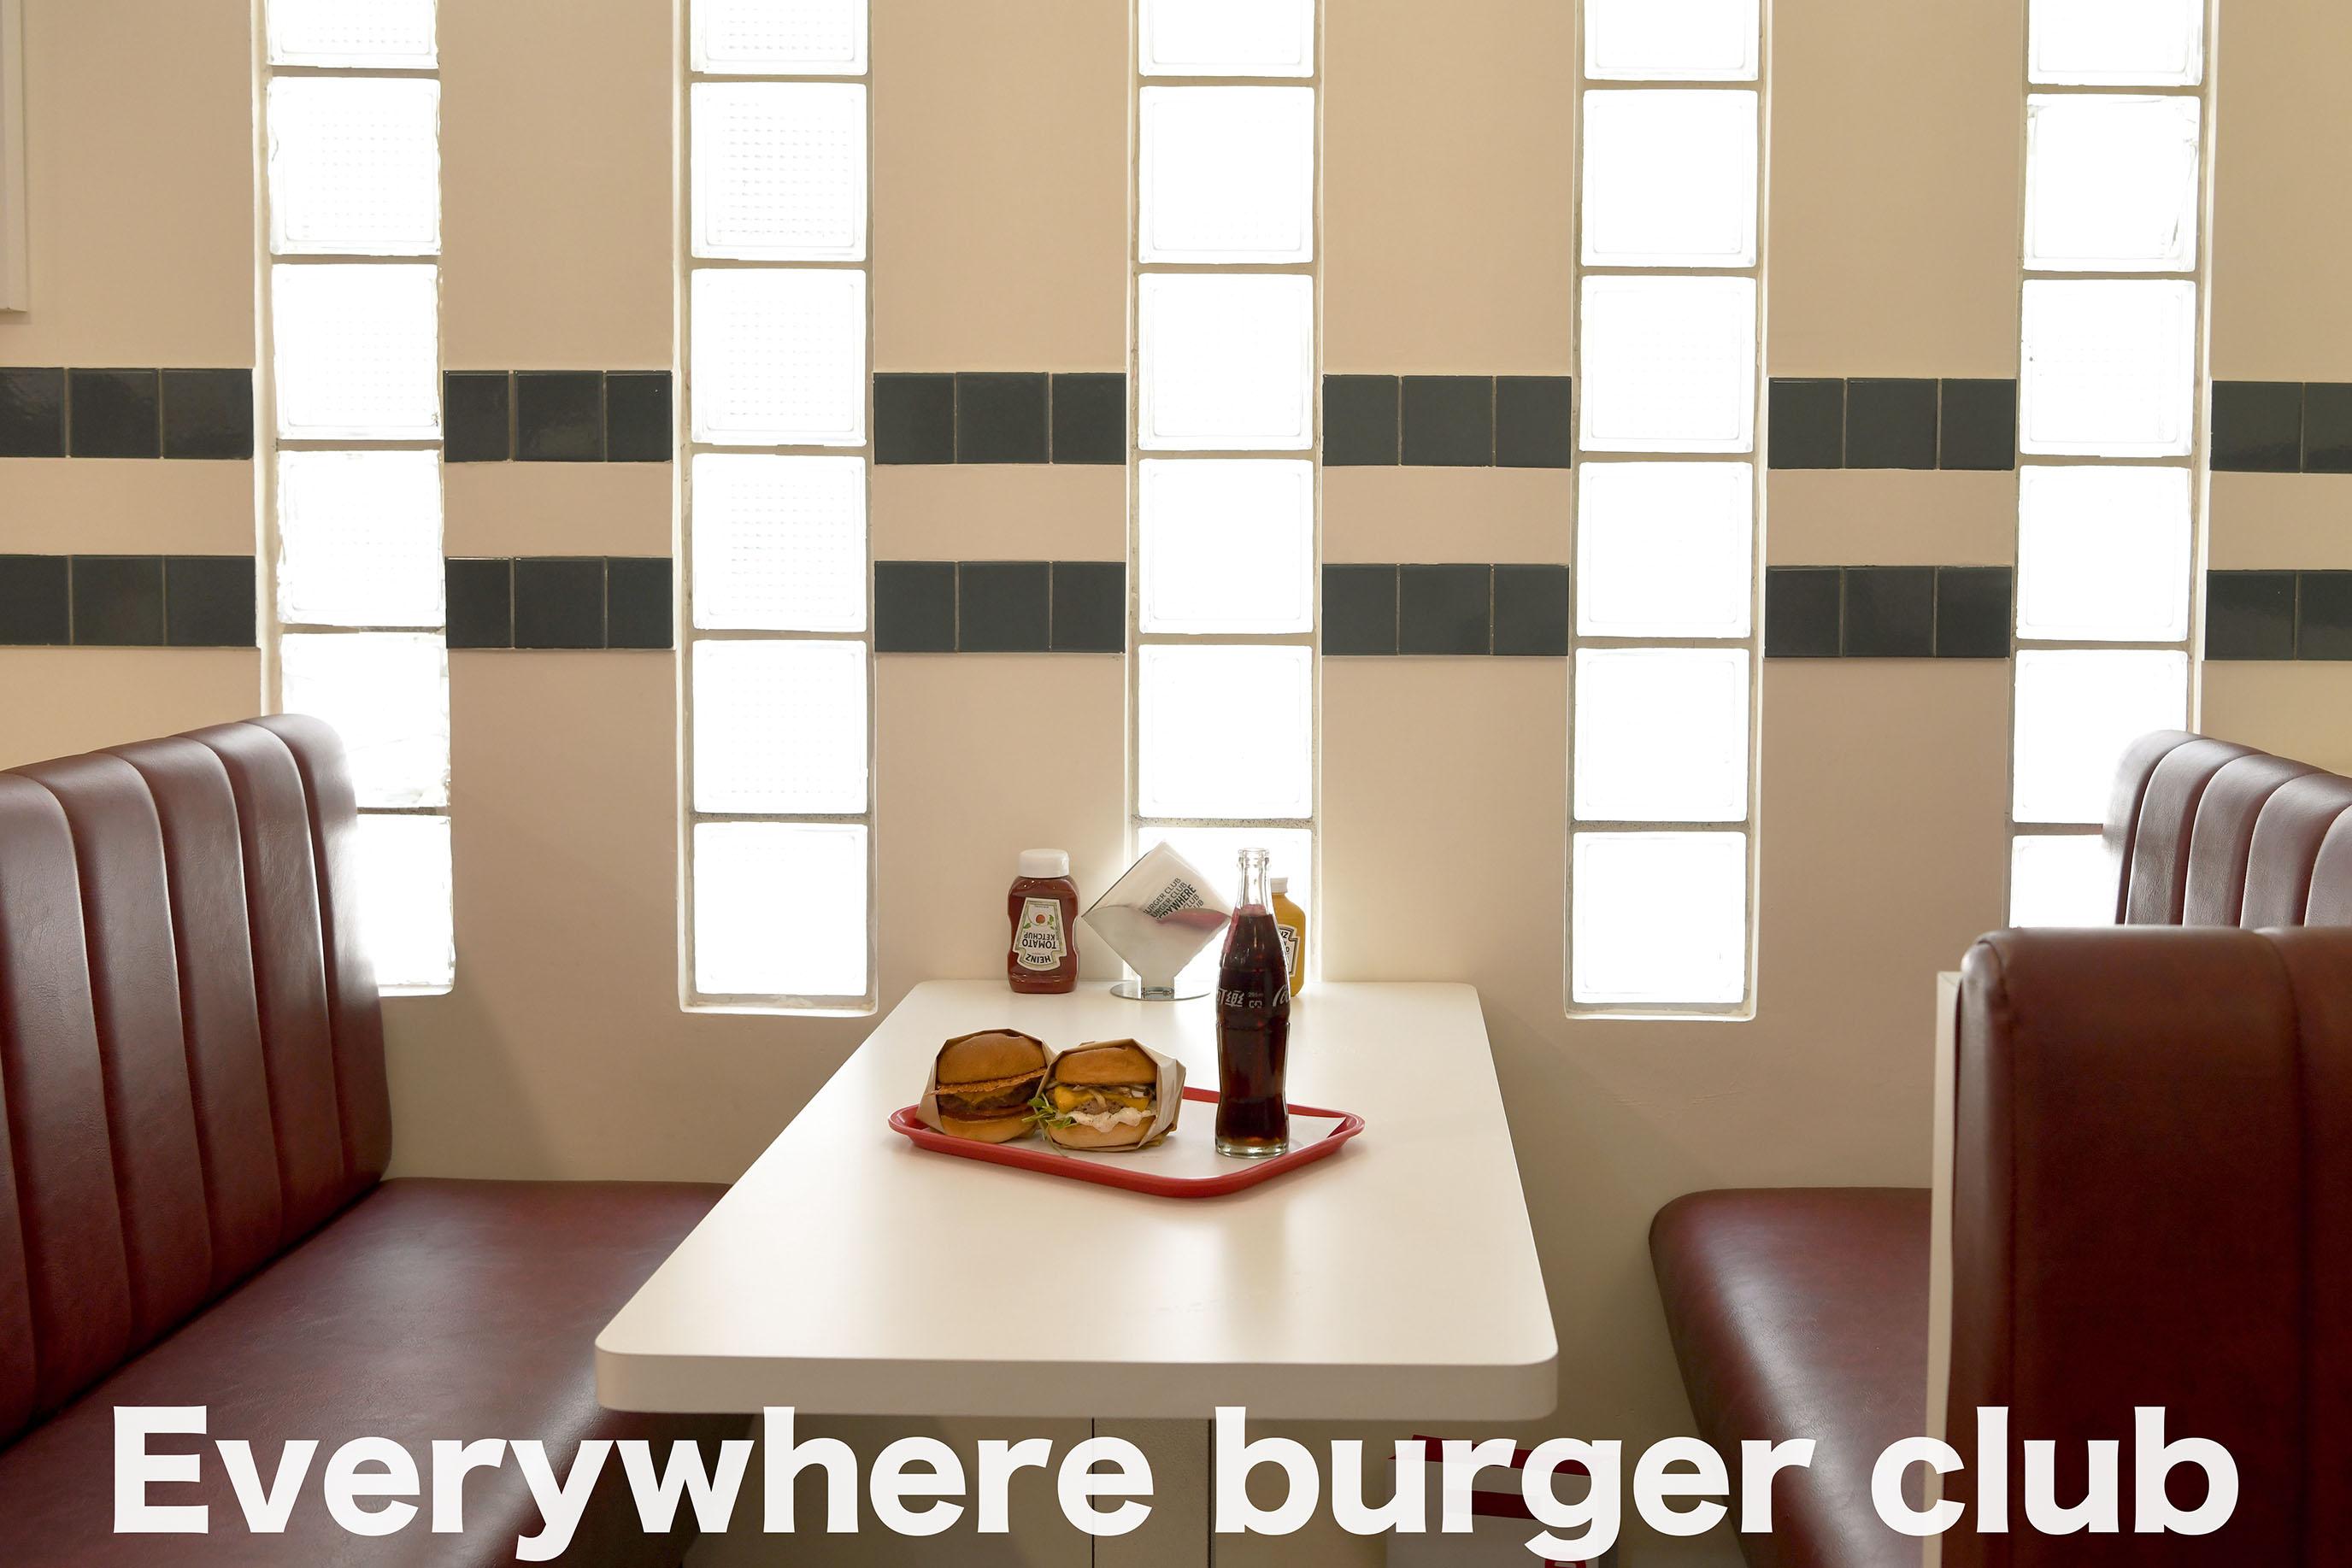 Everywhere burger club 漢堡俱樂部|兩個大男孩的手作漢堡,在台北城市裡重新出發。 @MENS 30S LIFE